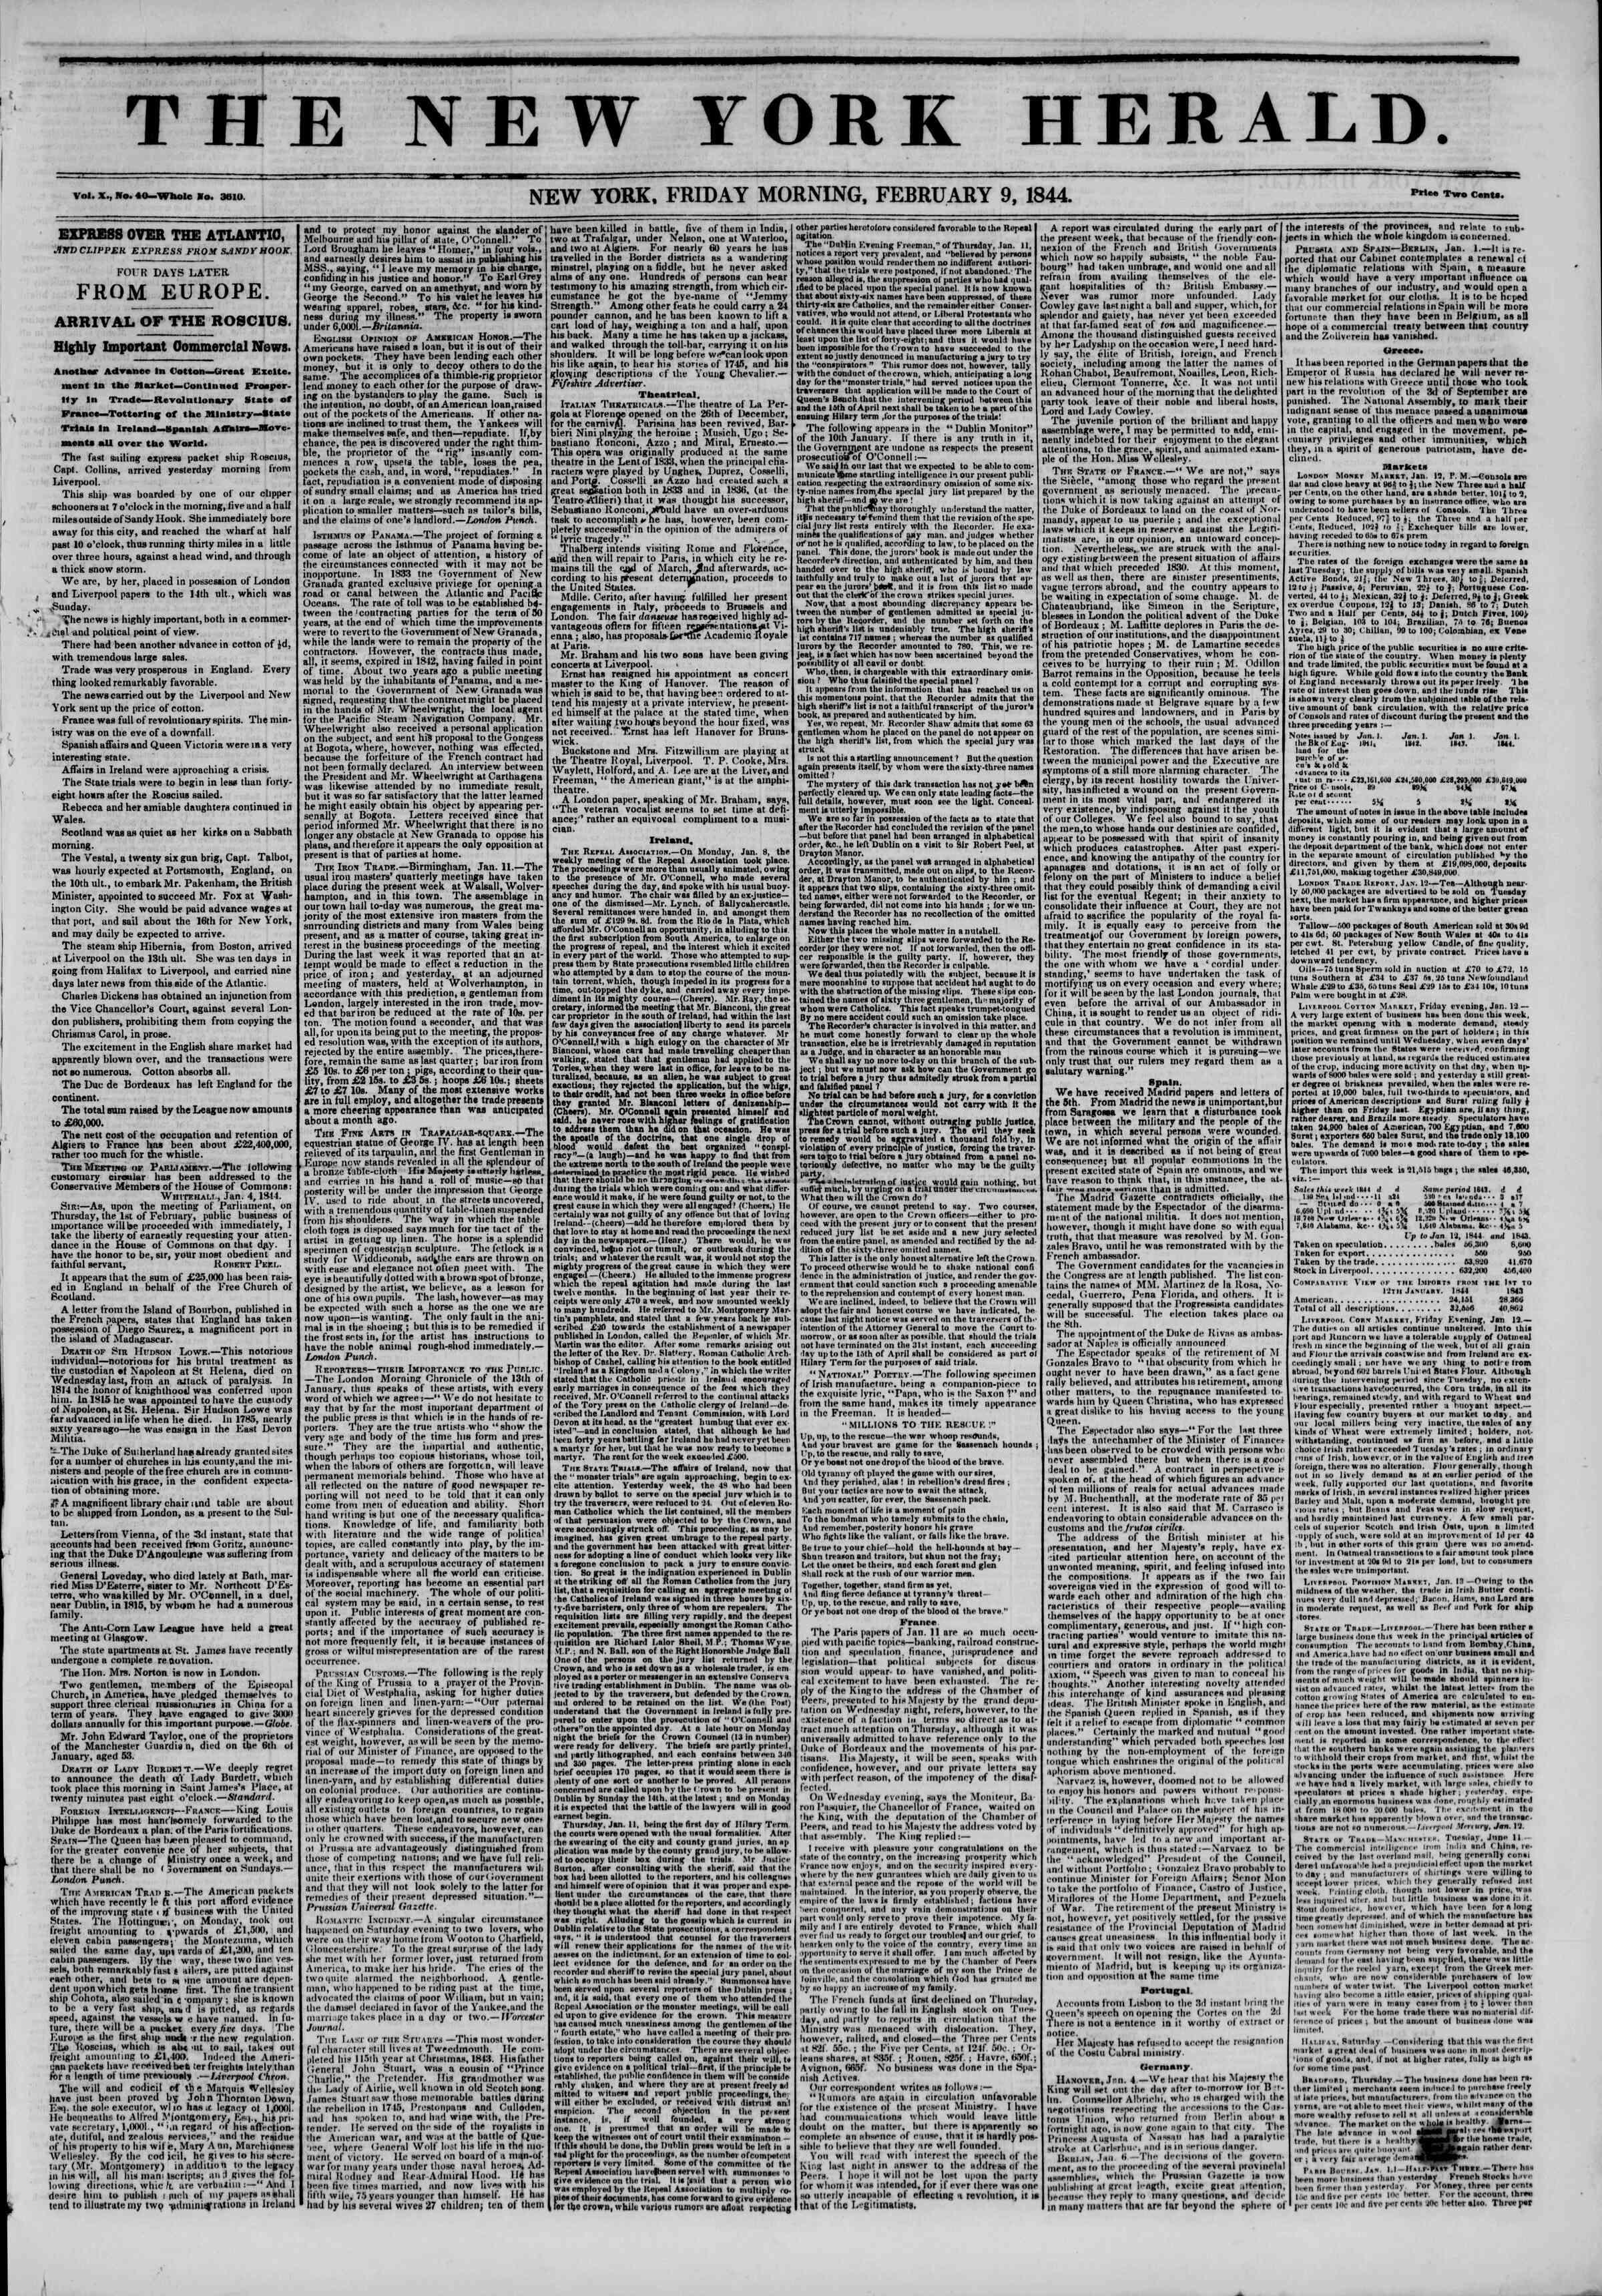 February 9, 1844 Tarihli The New York Herald Gazetesi Sayfa 1